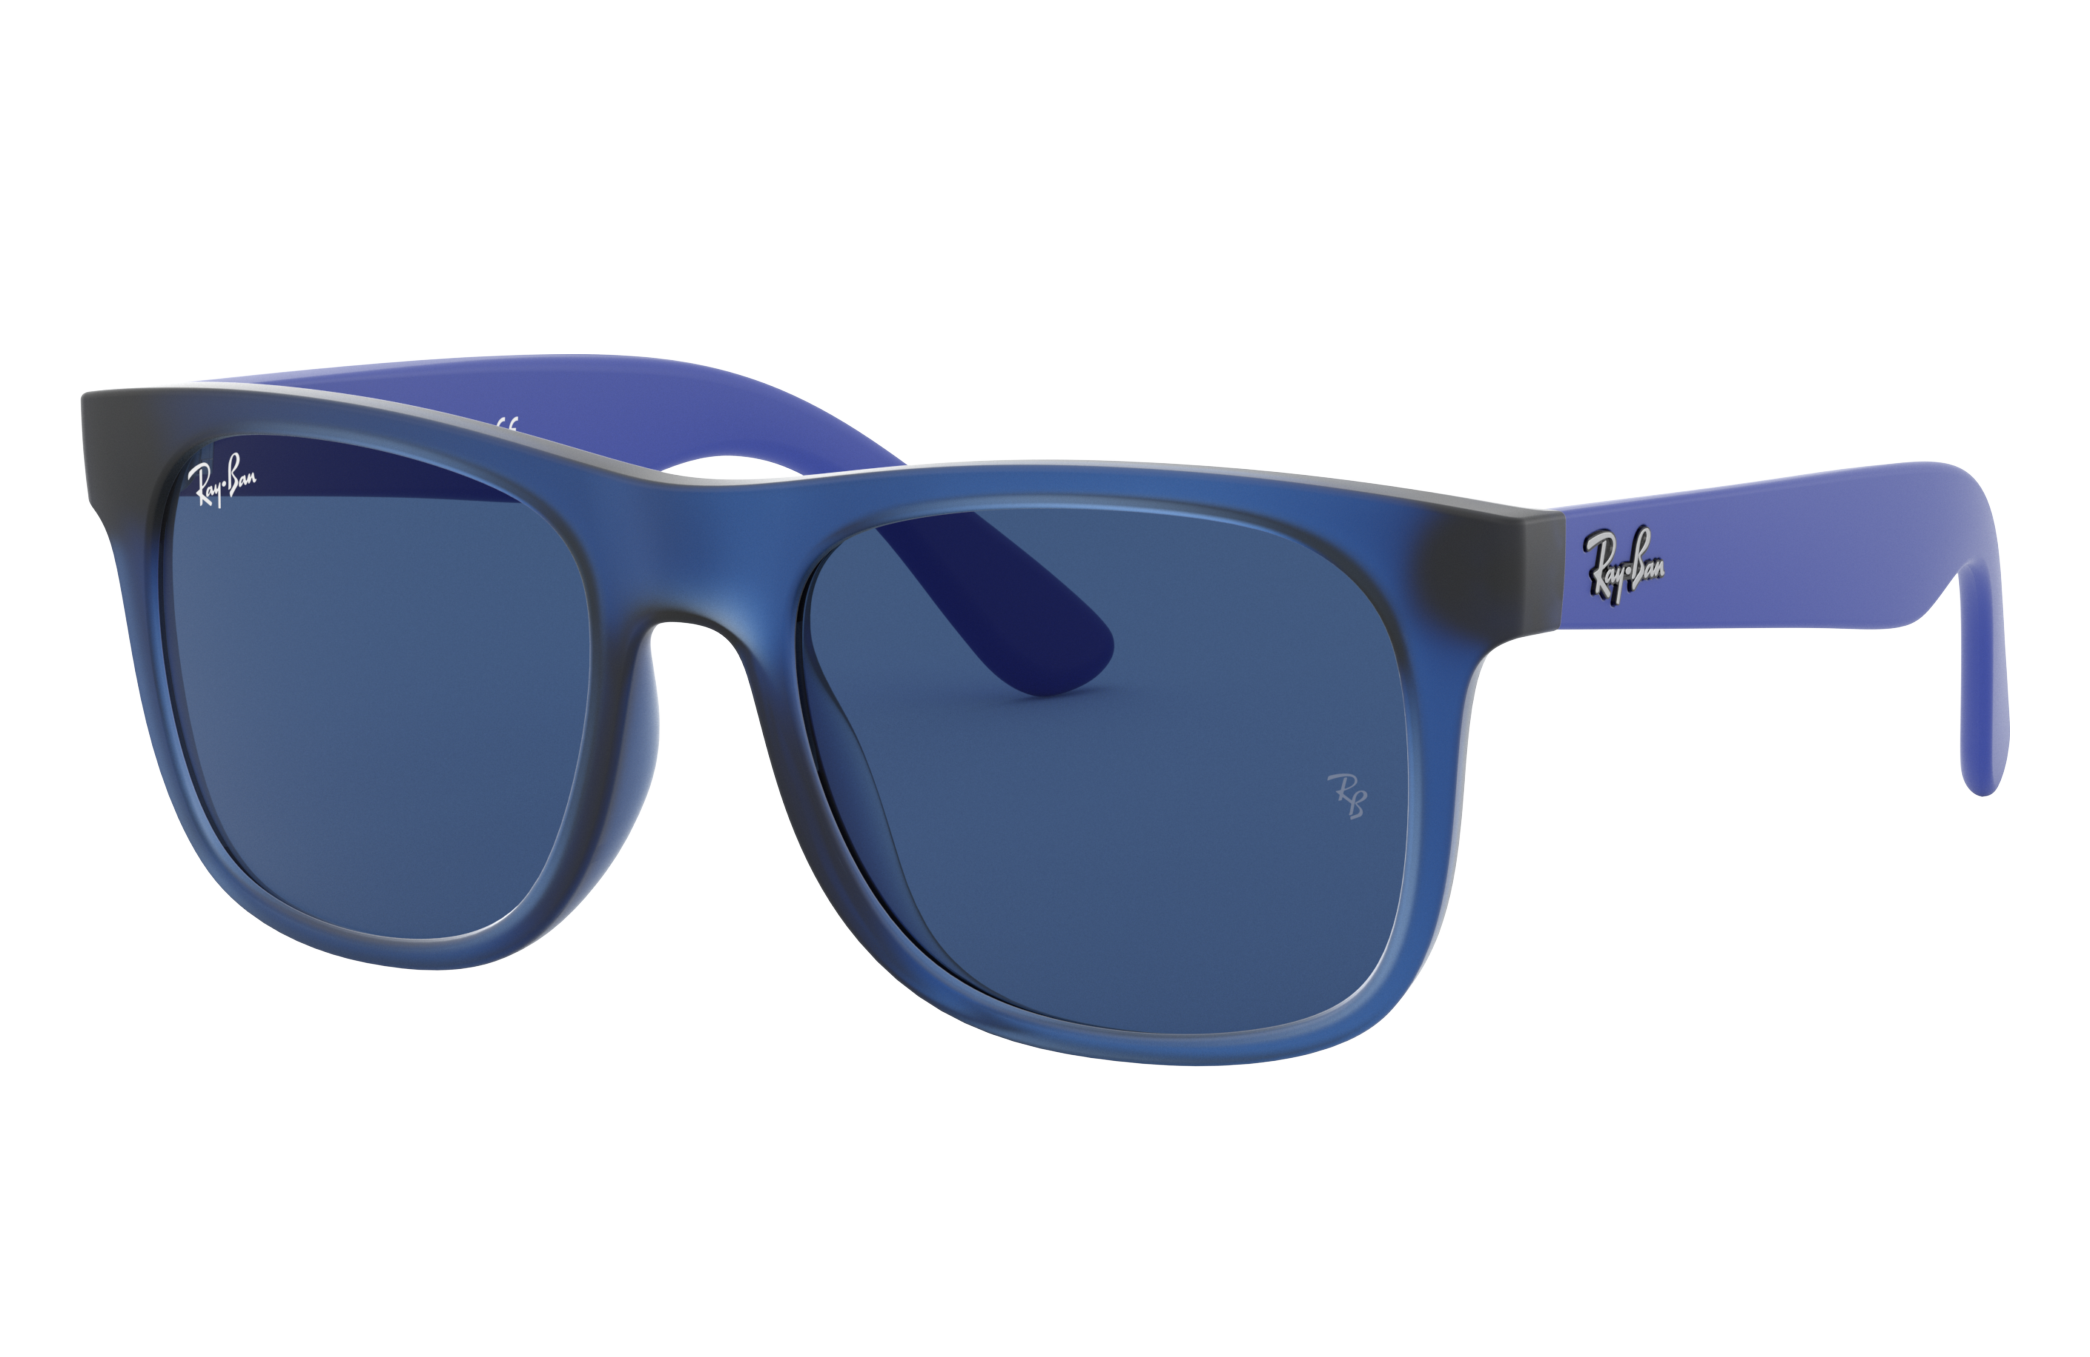 Ray-Ban Rj9069s Rubber Blue, Blue Lenses - RJ9069S